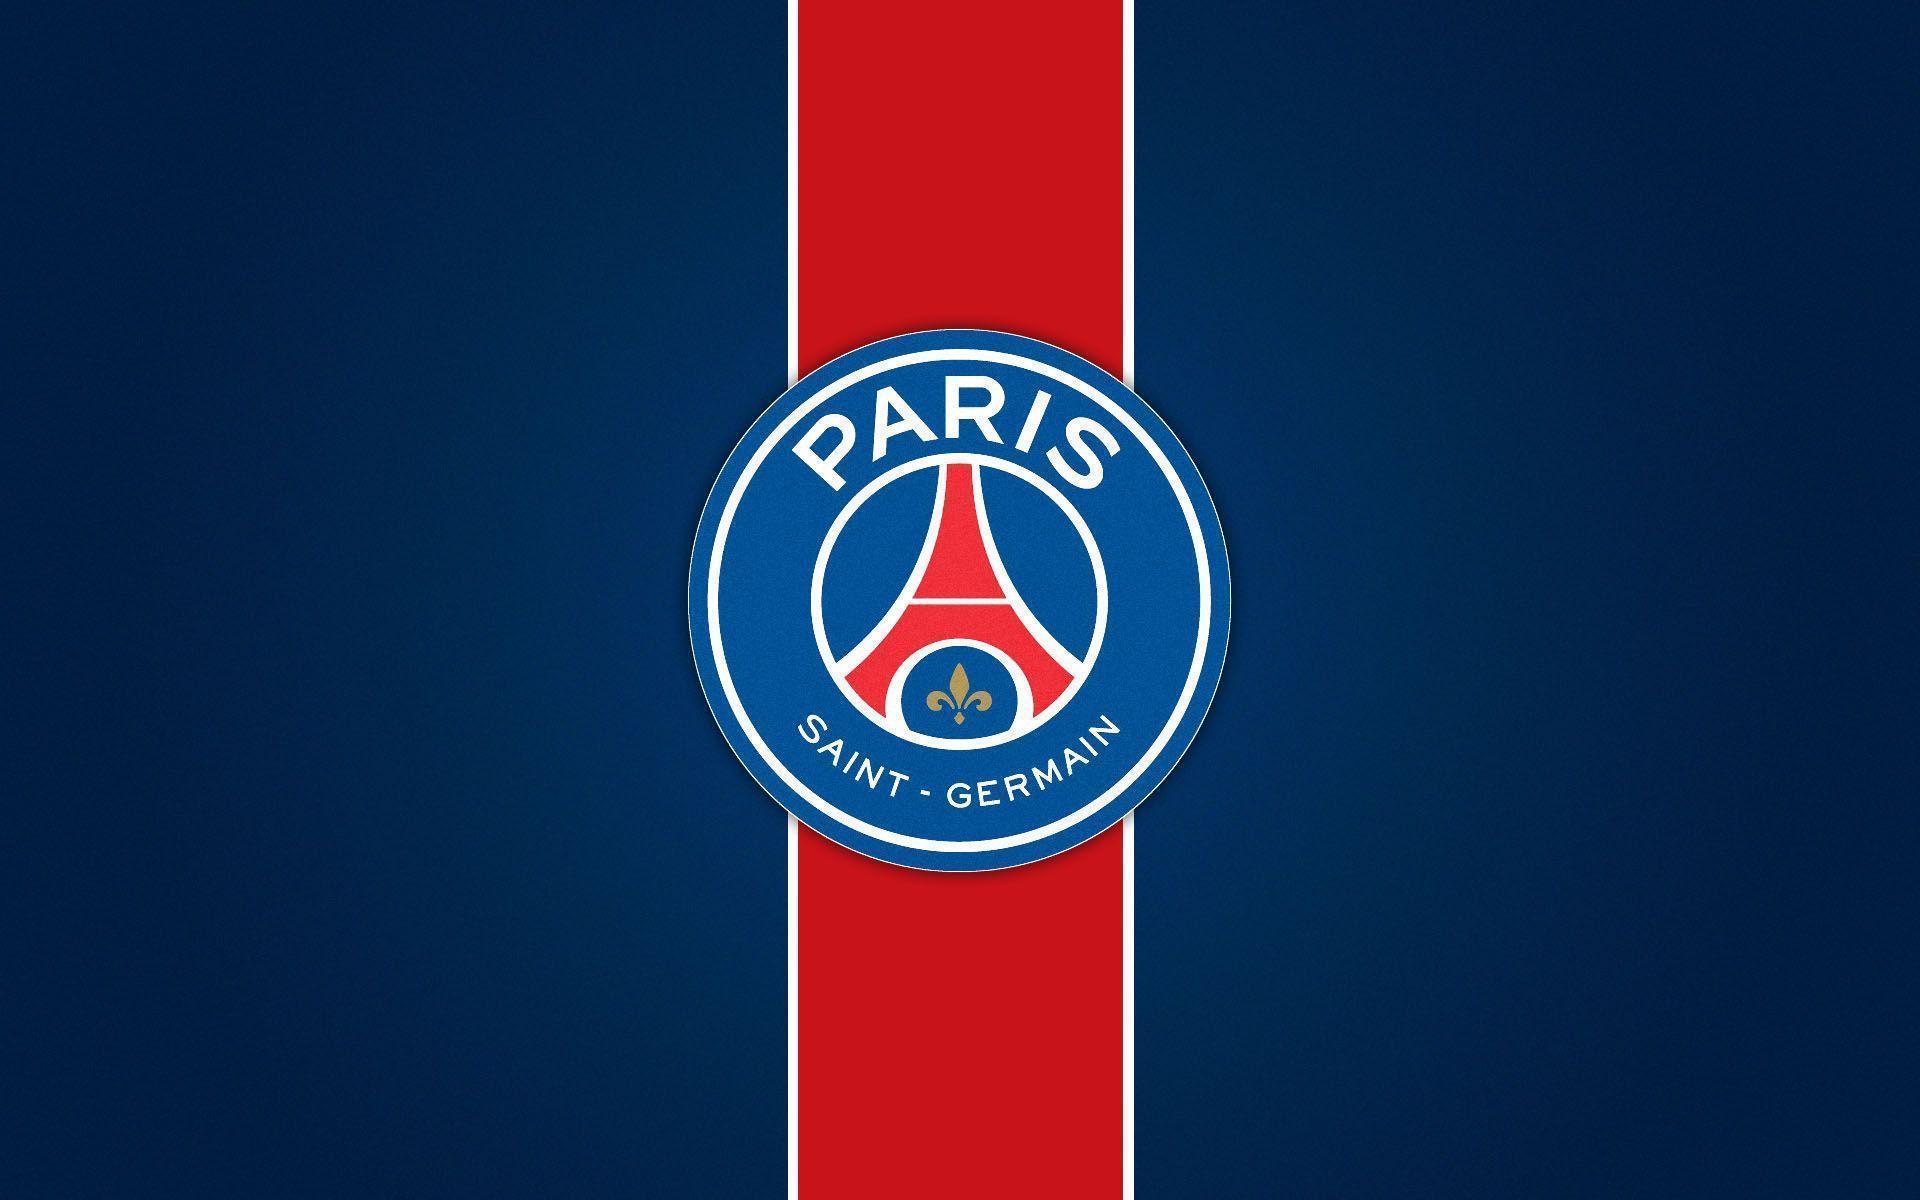 Paris Saint